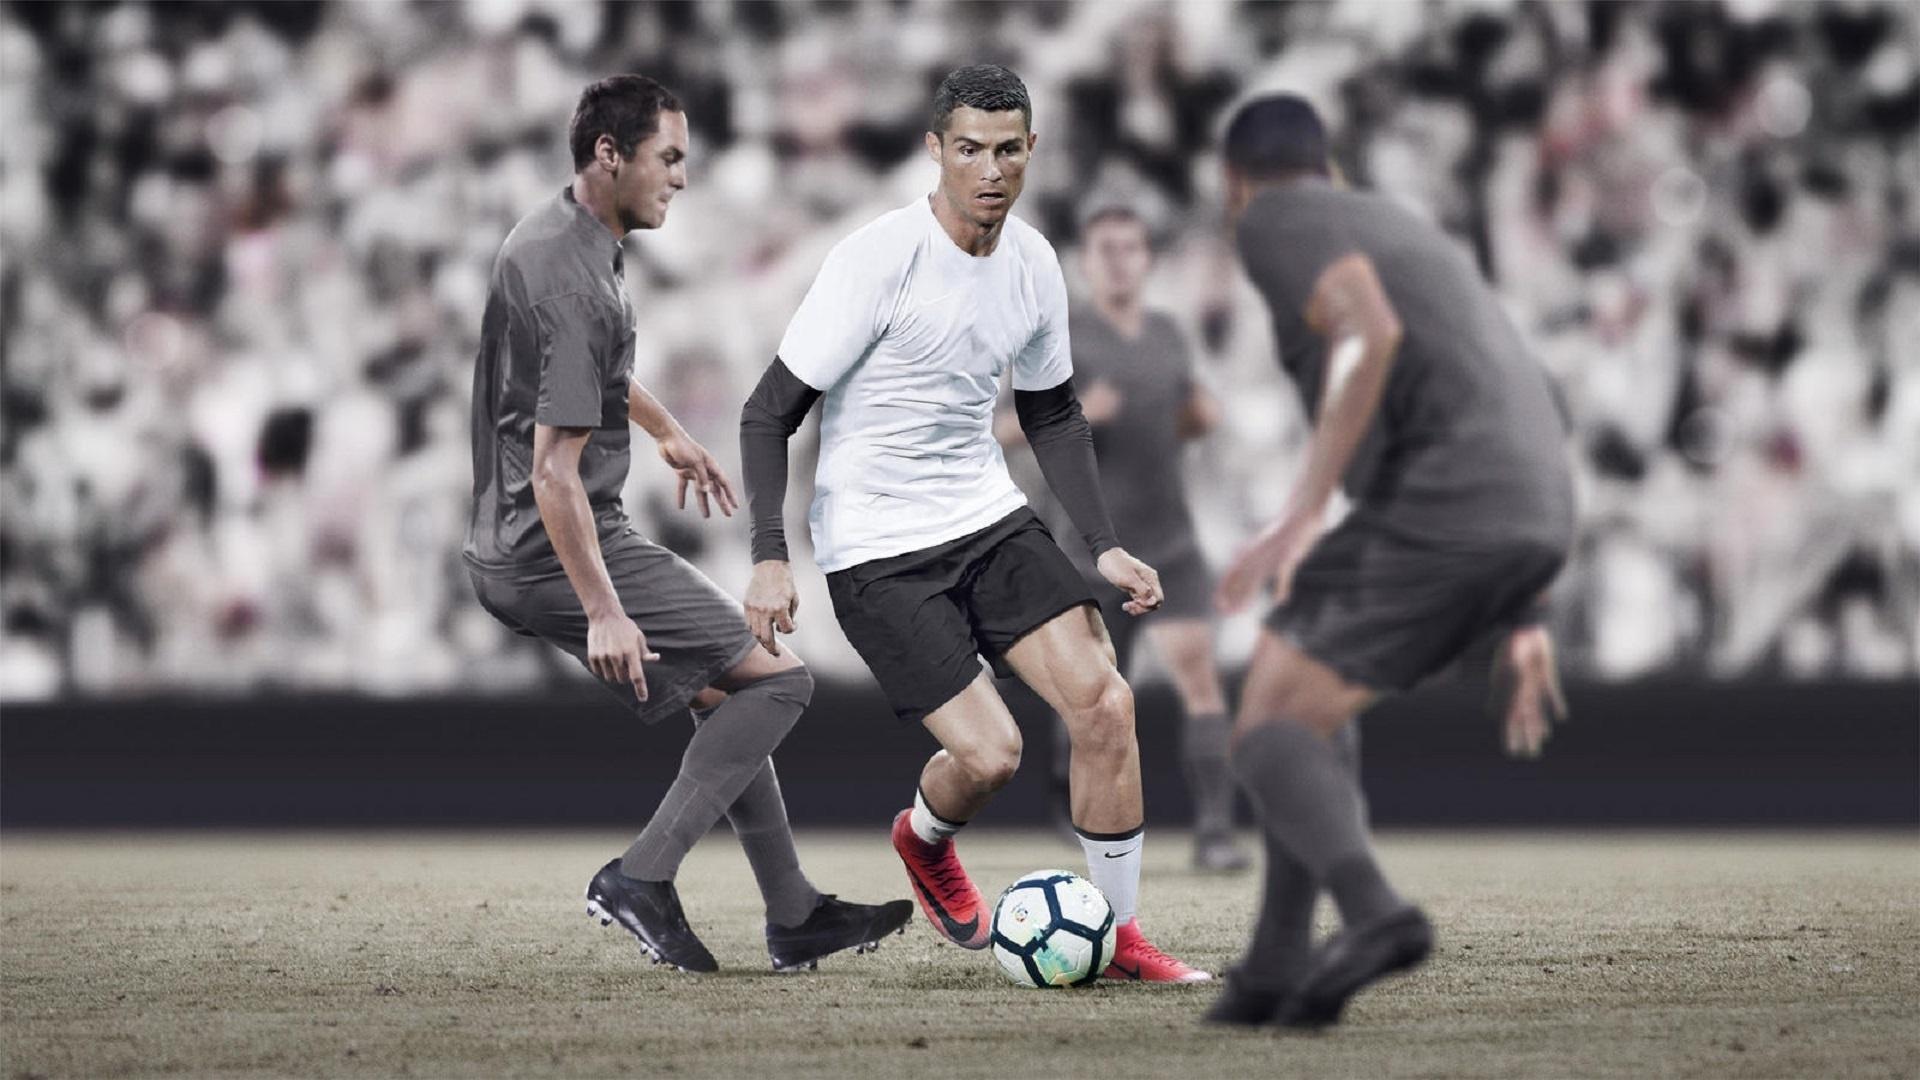 Cristiano Ronaldo - BOL Fotos - BOL Fotos 3a6a65a1bb82c